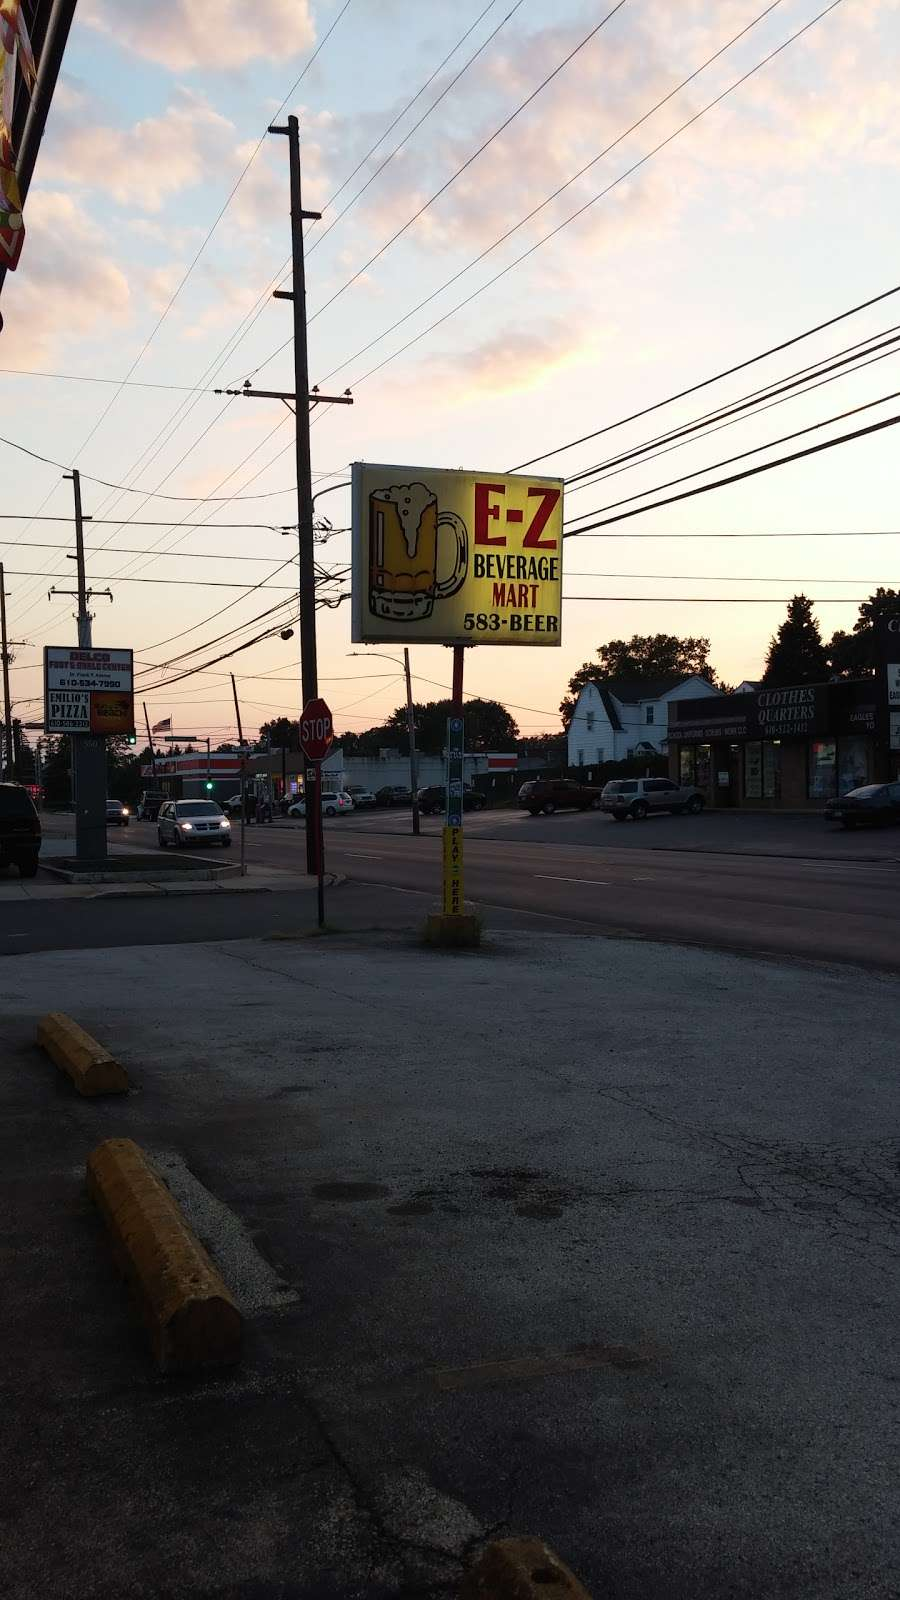 E Z Beverage - store    Photo 1 of 1   Address: 600 MacDade Boulevard, Folsom, PA 19033, USA   Phone: (610) 583-2337